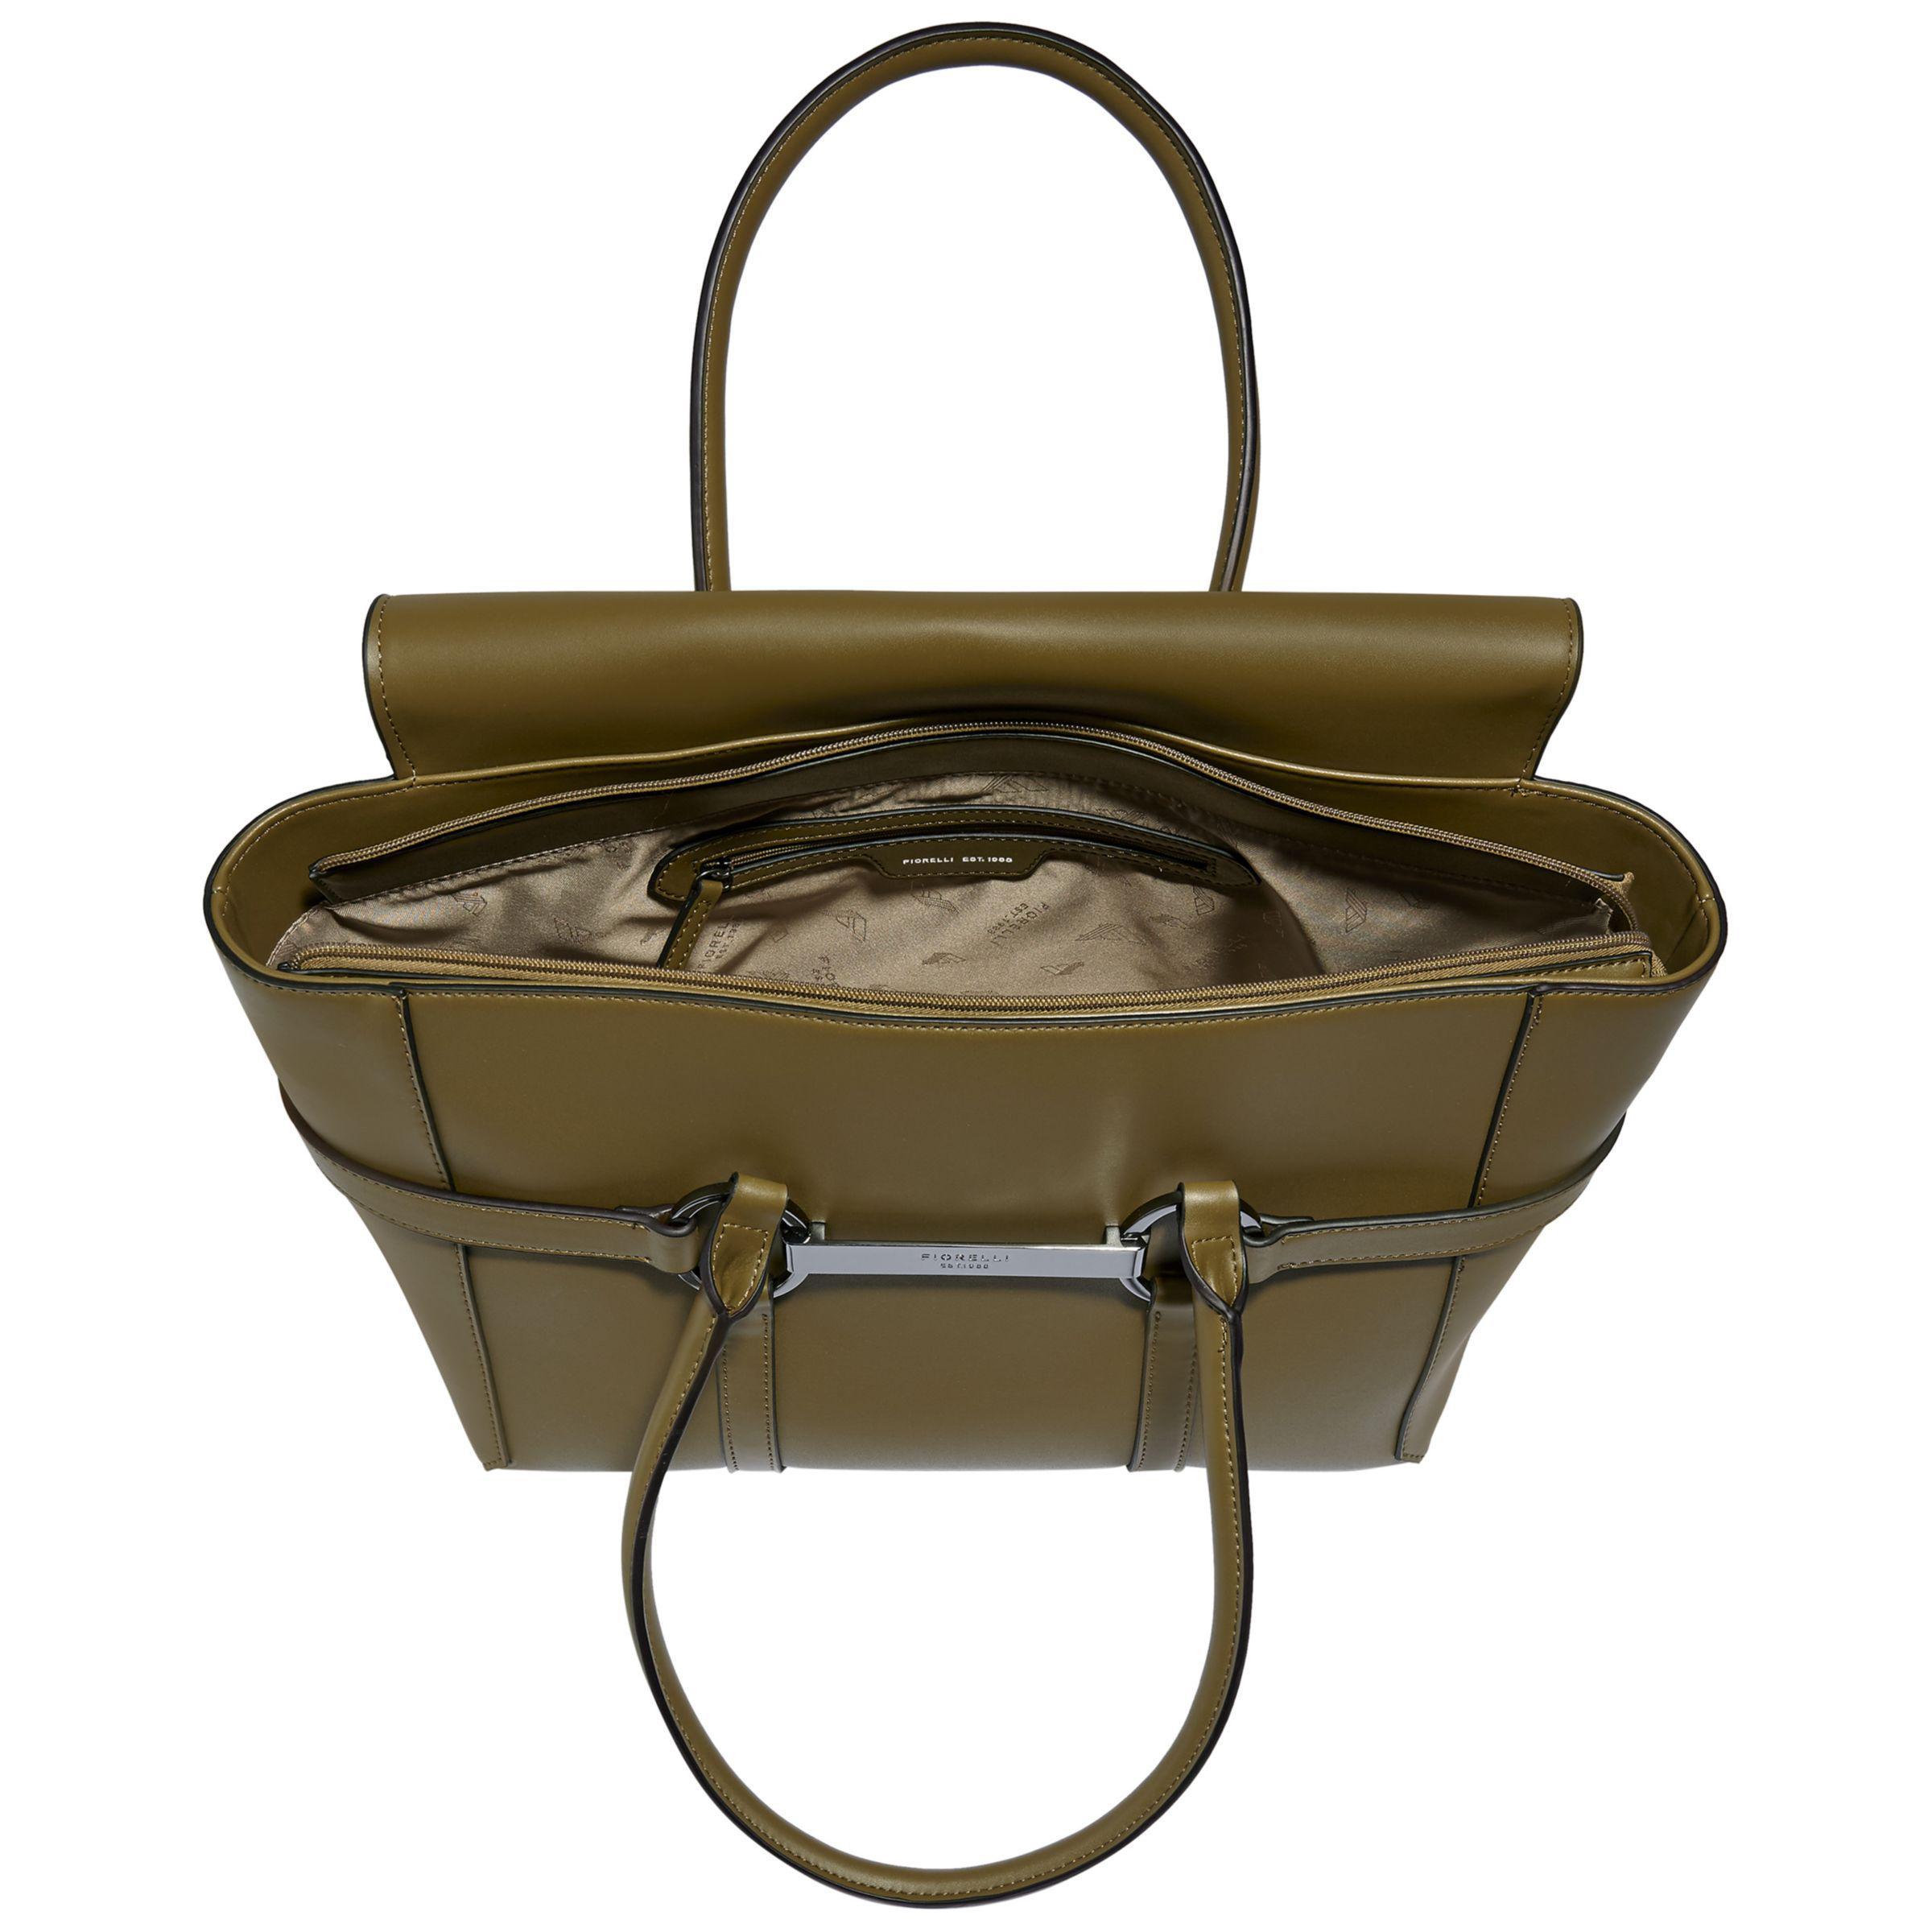 Fiorelli Barbican Large Flapover Tote Bag in Olive (Green)